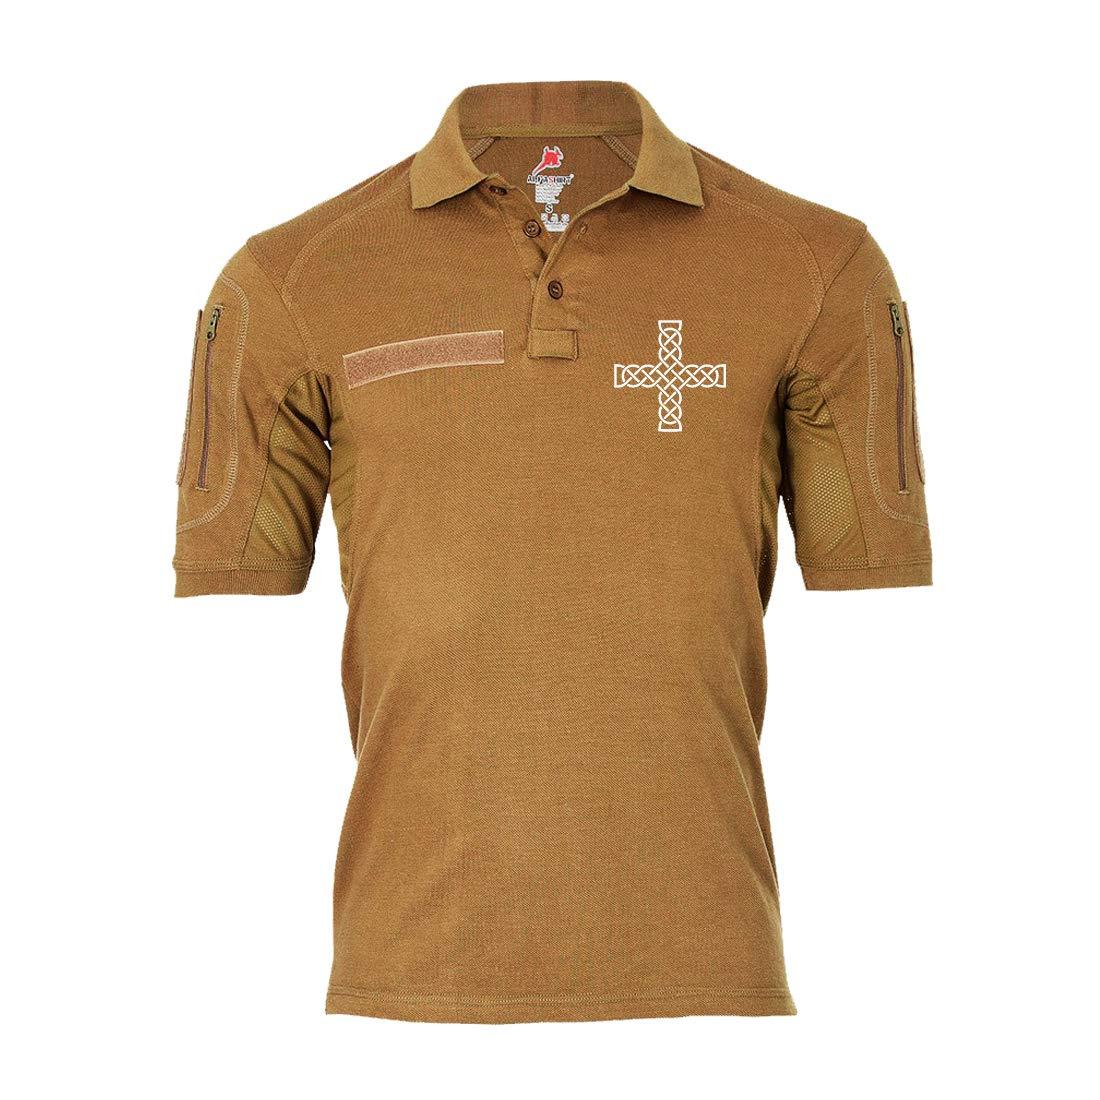 Copytec Tactical Poloshirt Alfa Keltisches Keltenkreuz Hoch irisches #19370